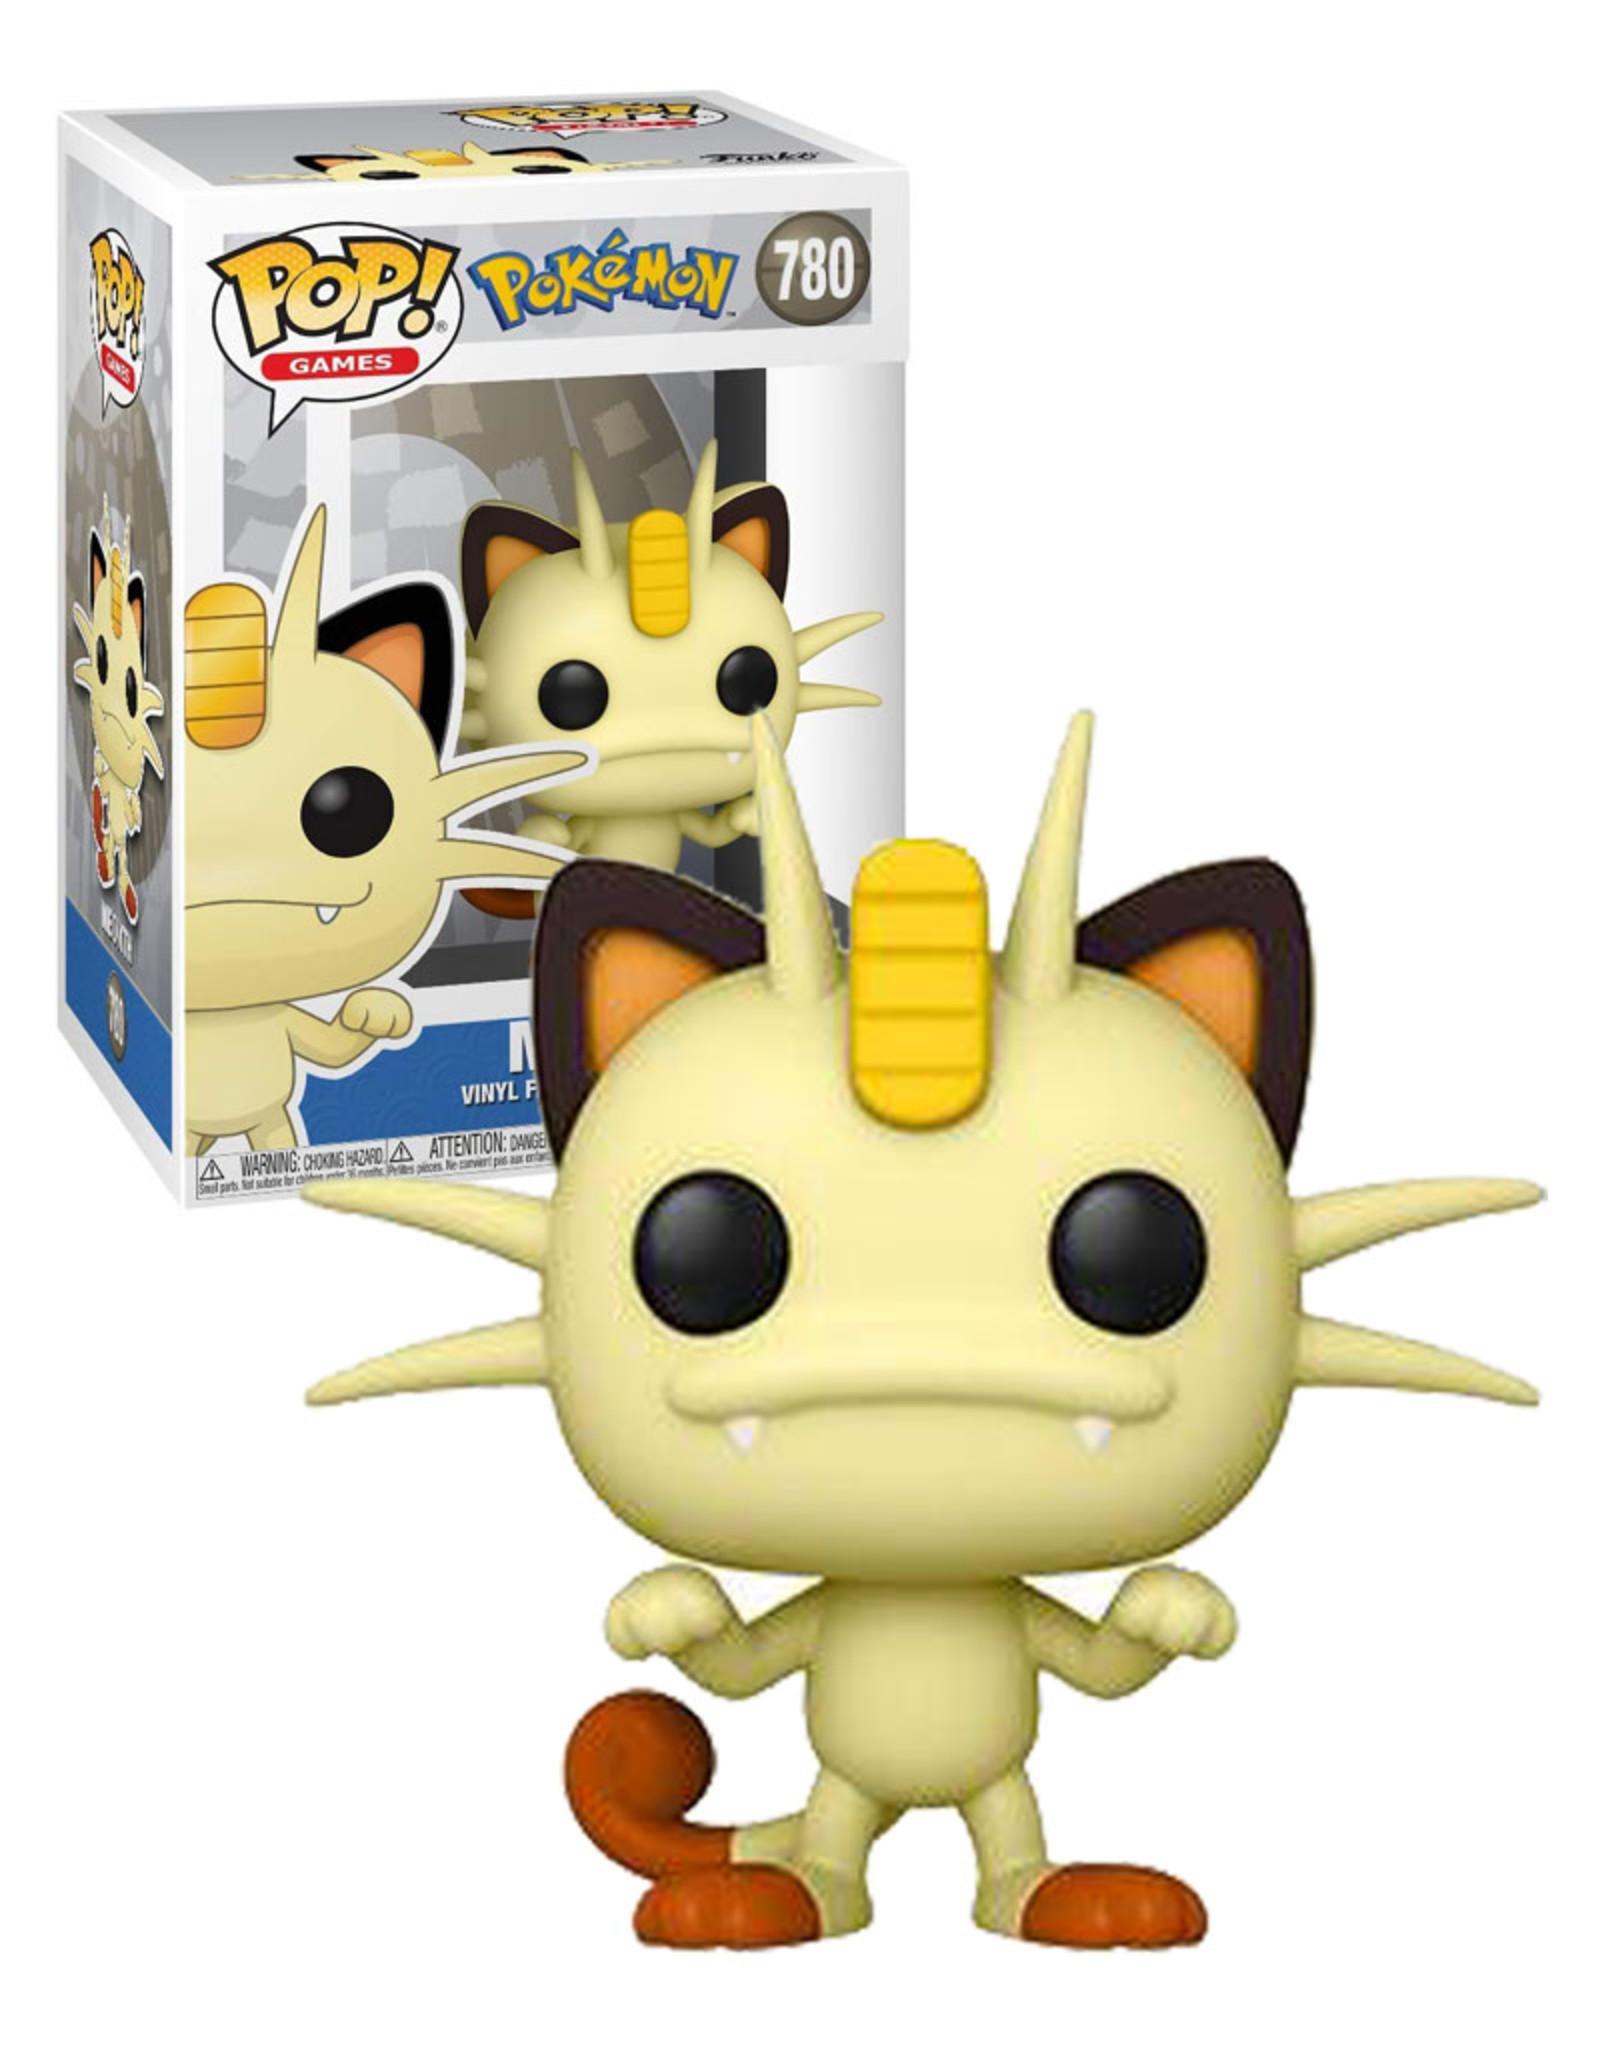 Pokémon 780 ( Funko Pop ) Meowth